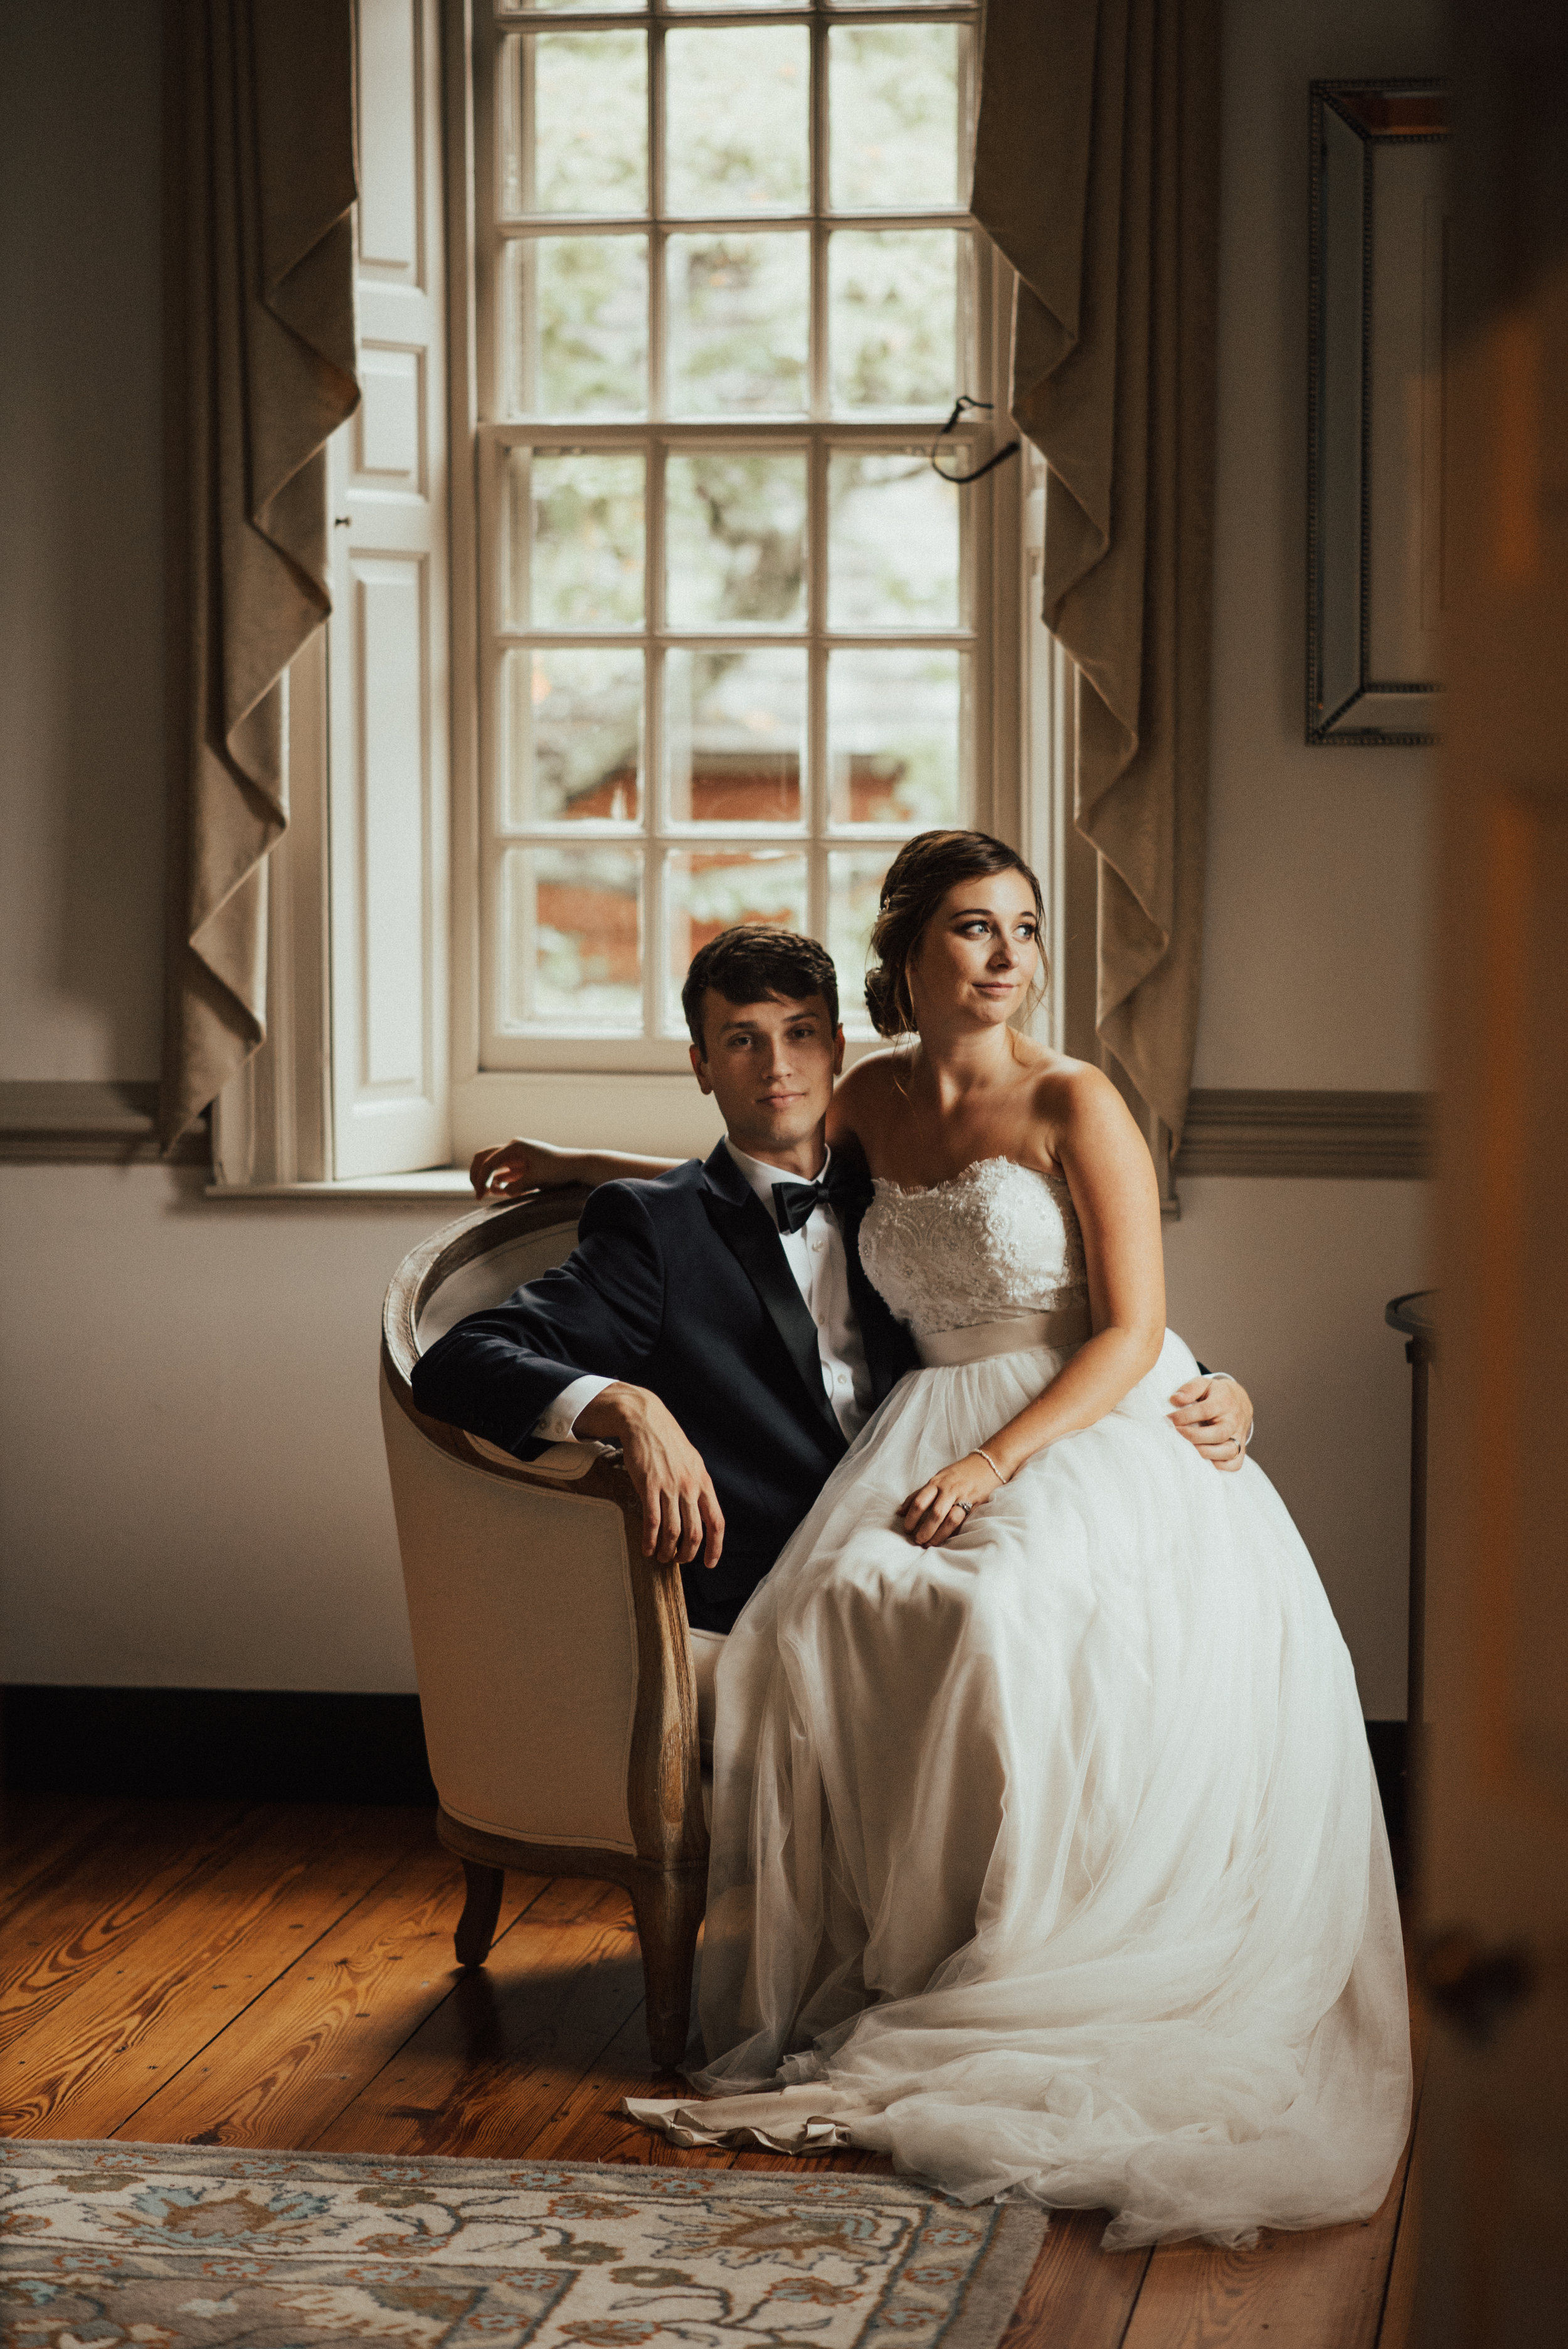 Richmond VA Wedding By SB Photographs323232.jpg